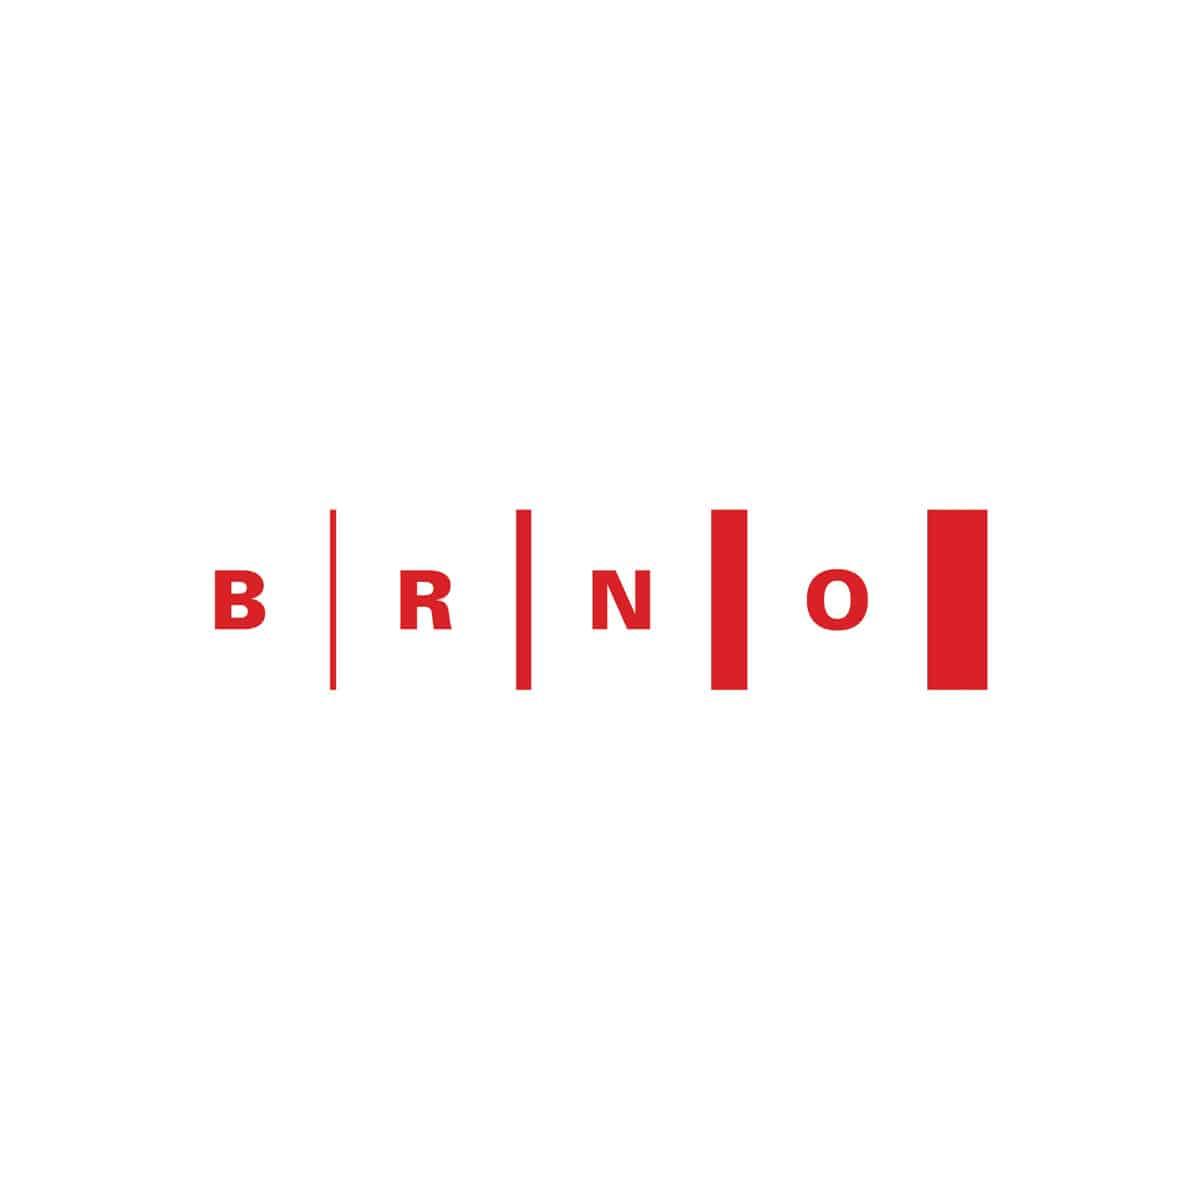 https://www.sokoljulianov.cz/wp-content/uploads/2021/09/brno-logo-vera-maresova-02.jpg